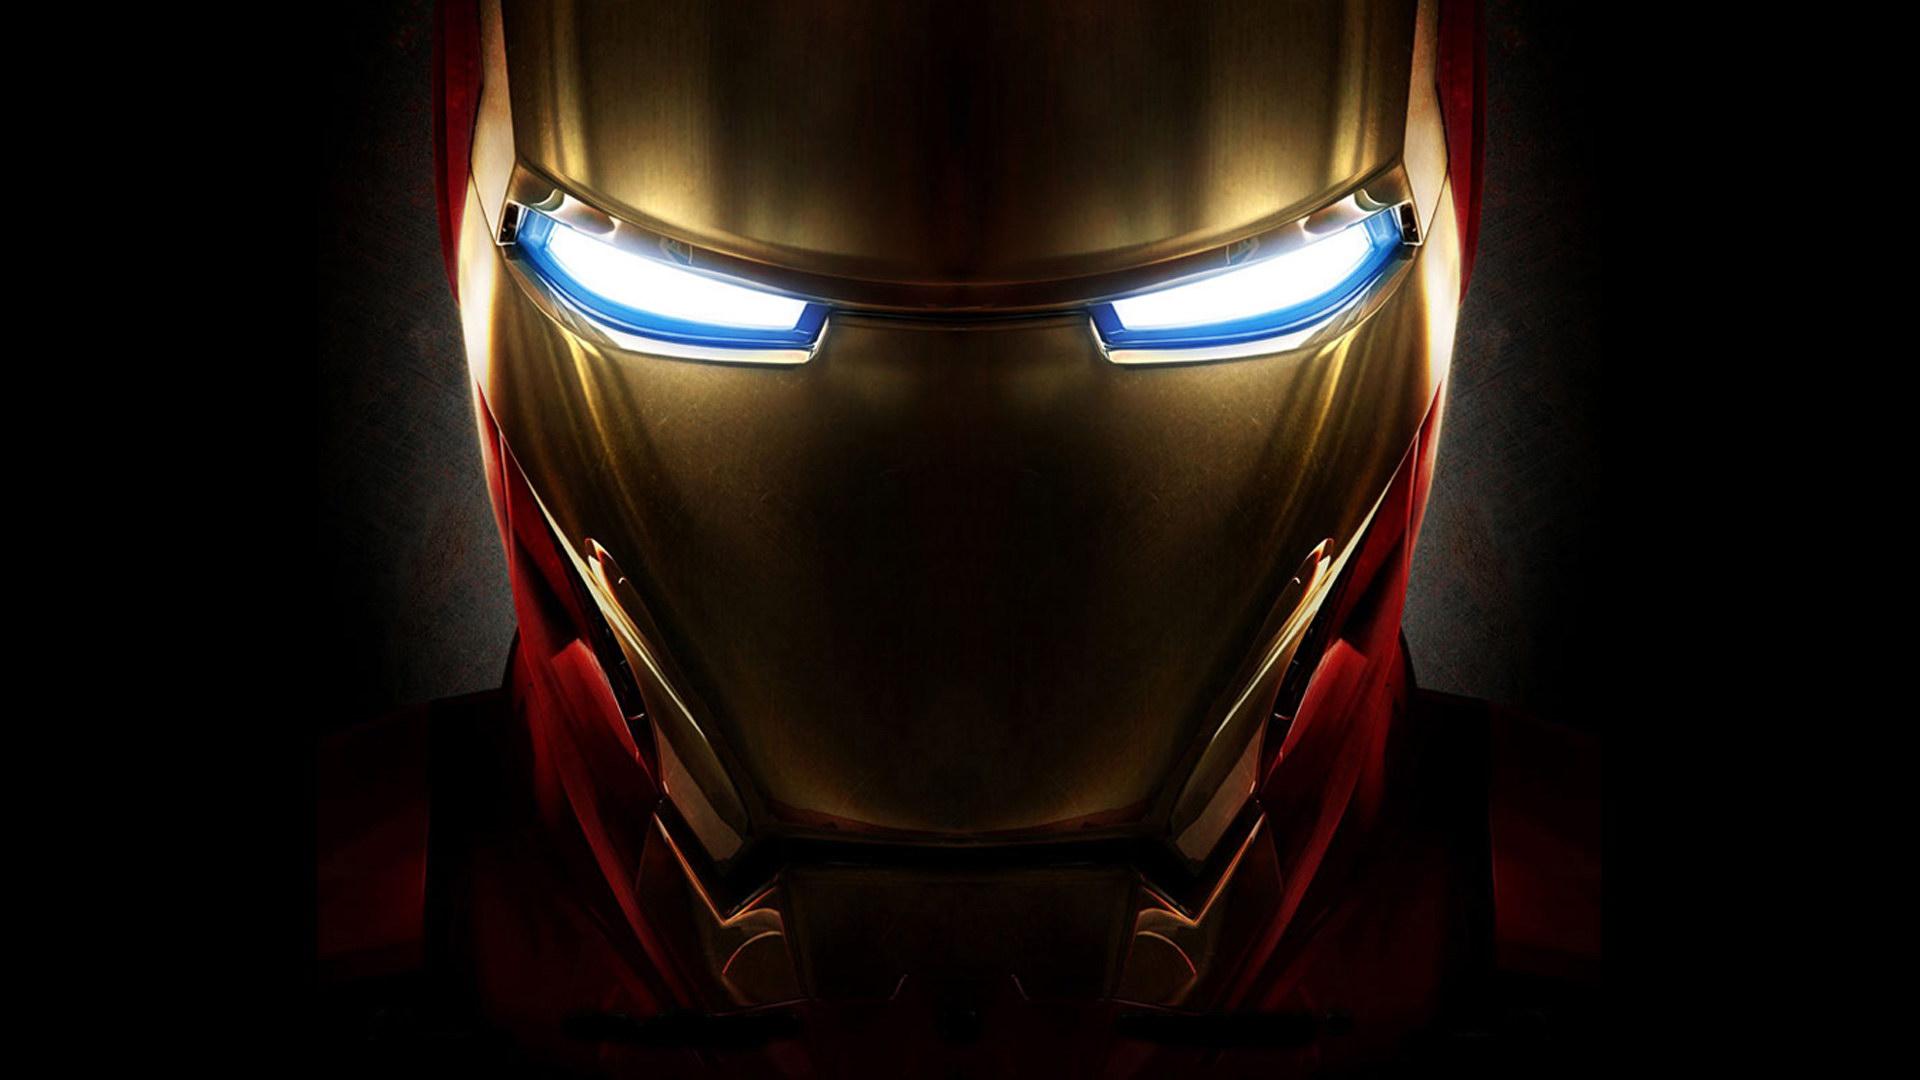 Iron Man HD Wallpaper Download HD Wallpapers for Desktop 1920x1080